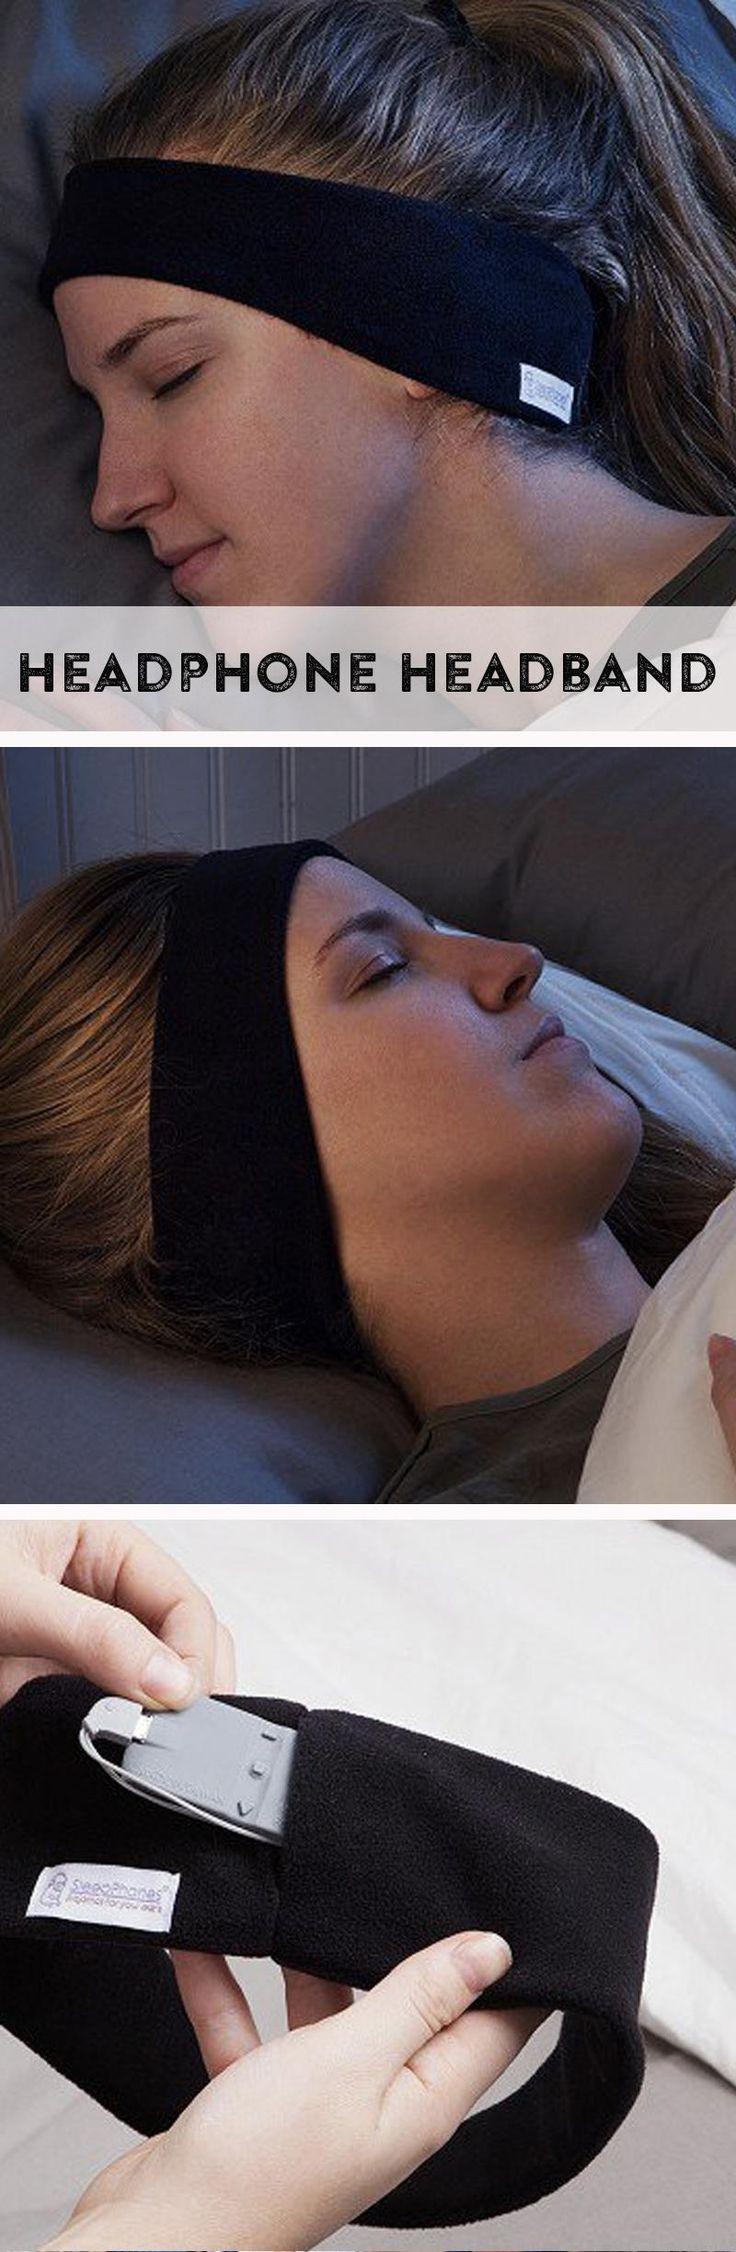 Headphone Headband